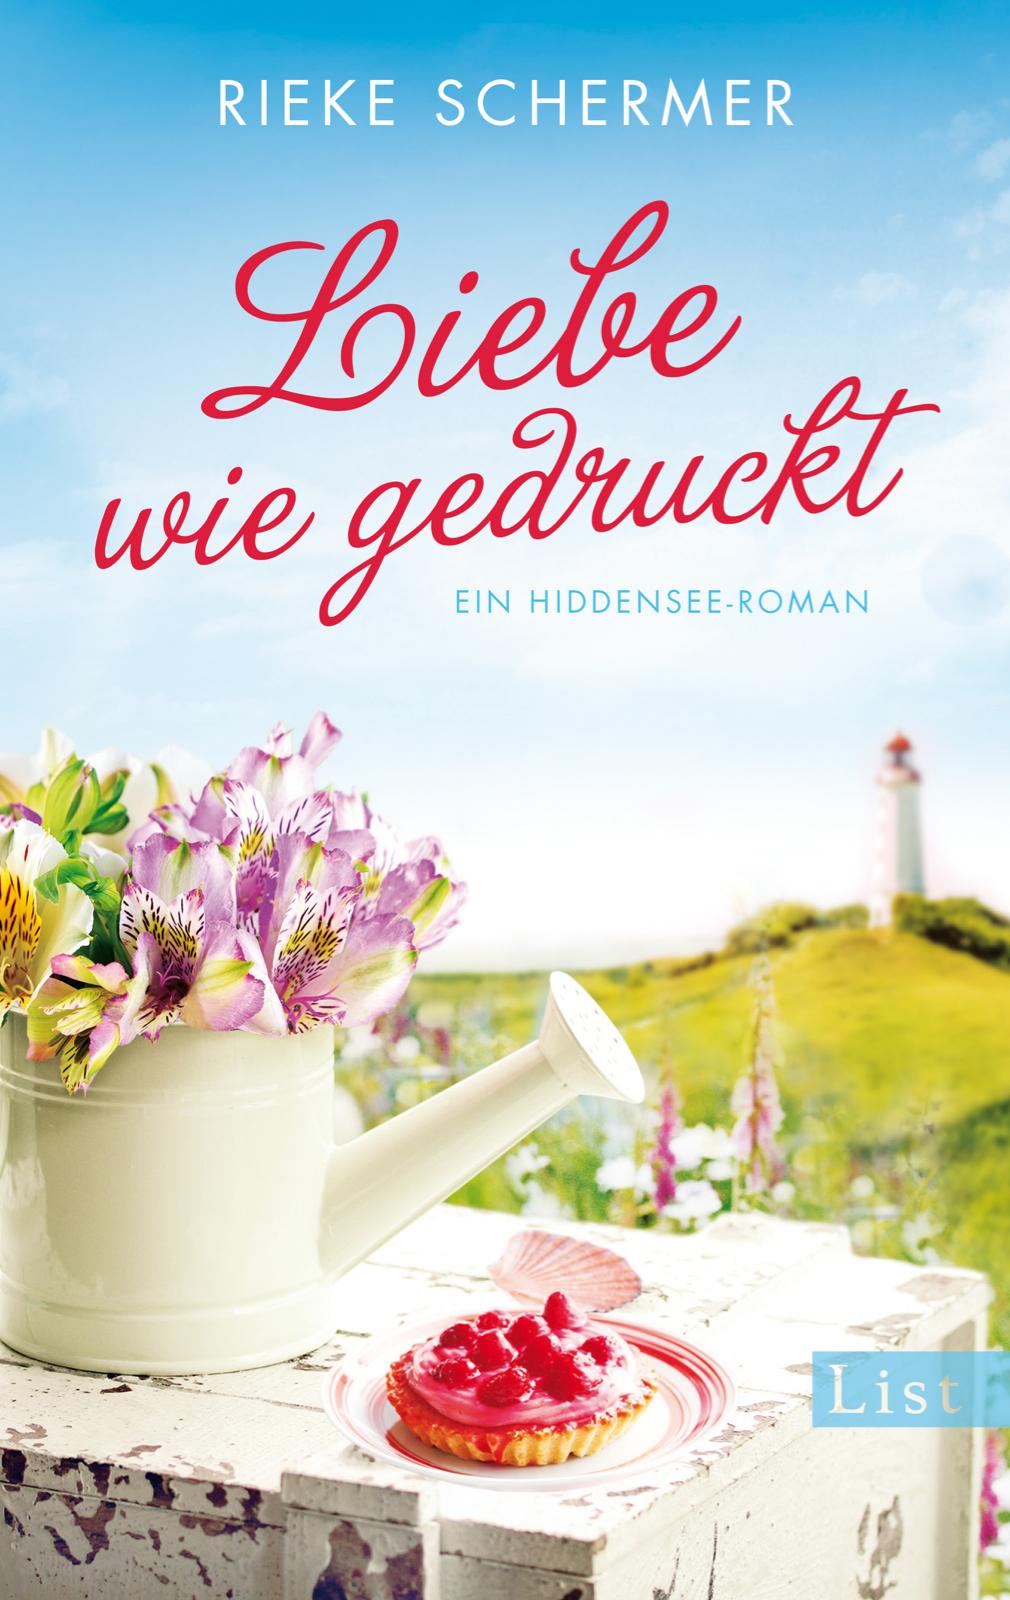 Liebe wie gedruckt (Rieke Schermer)*